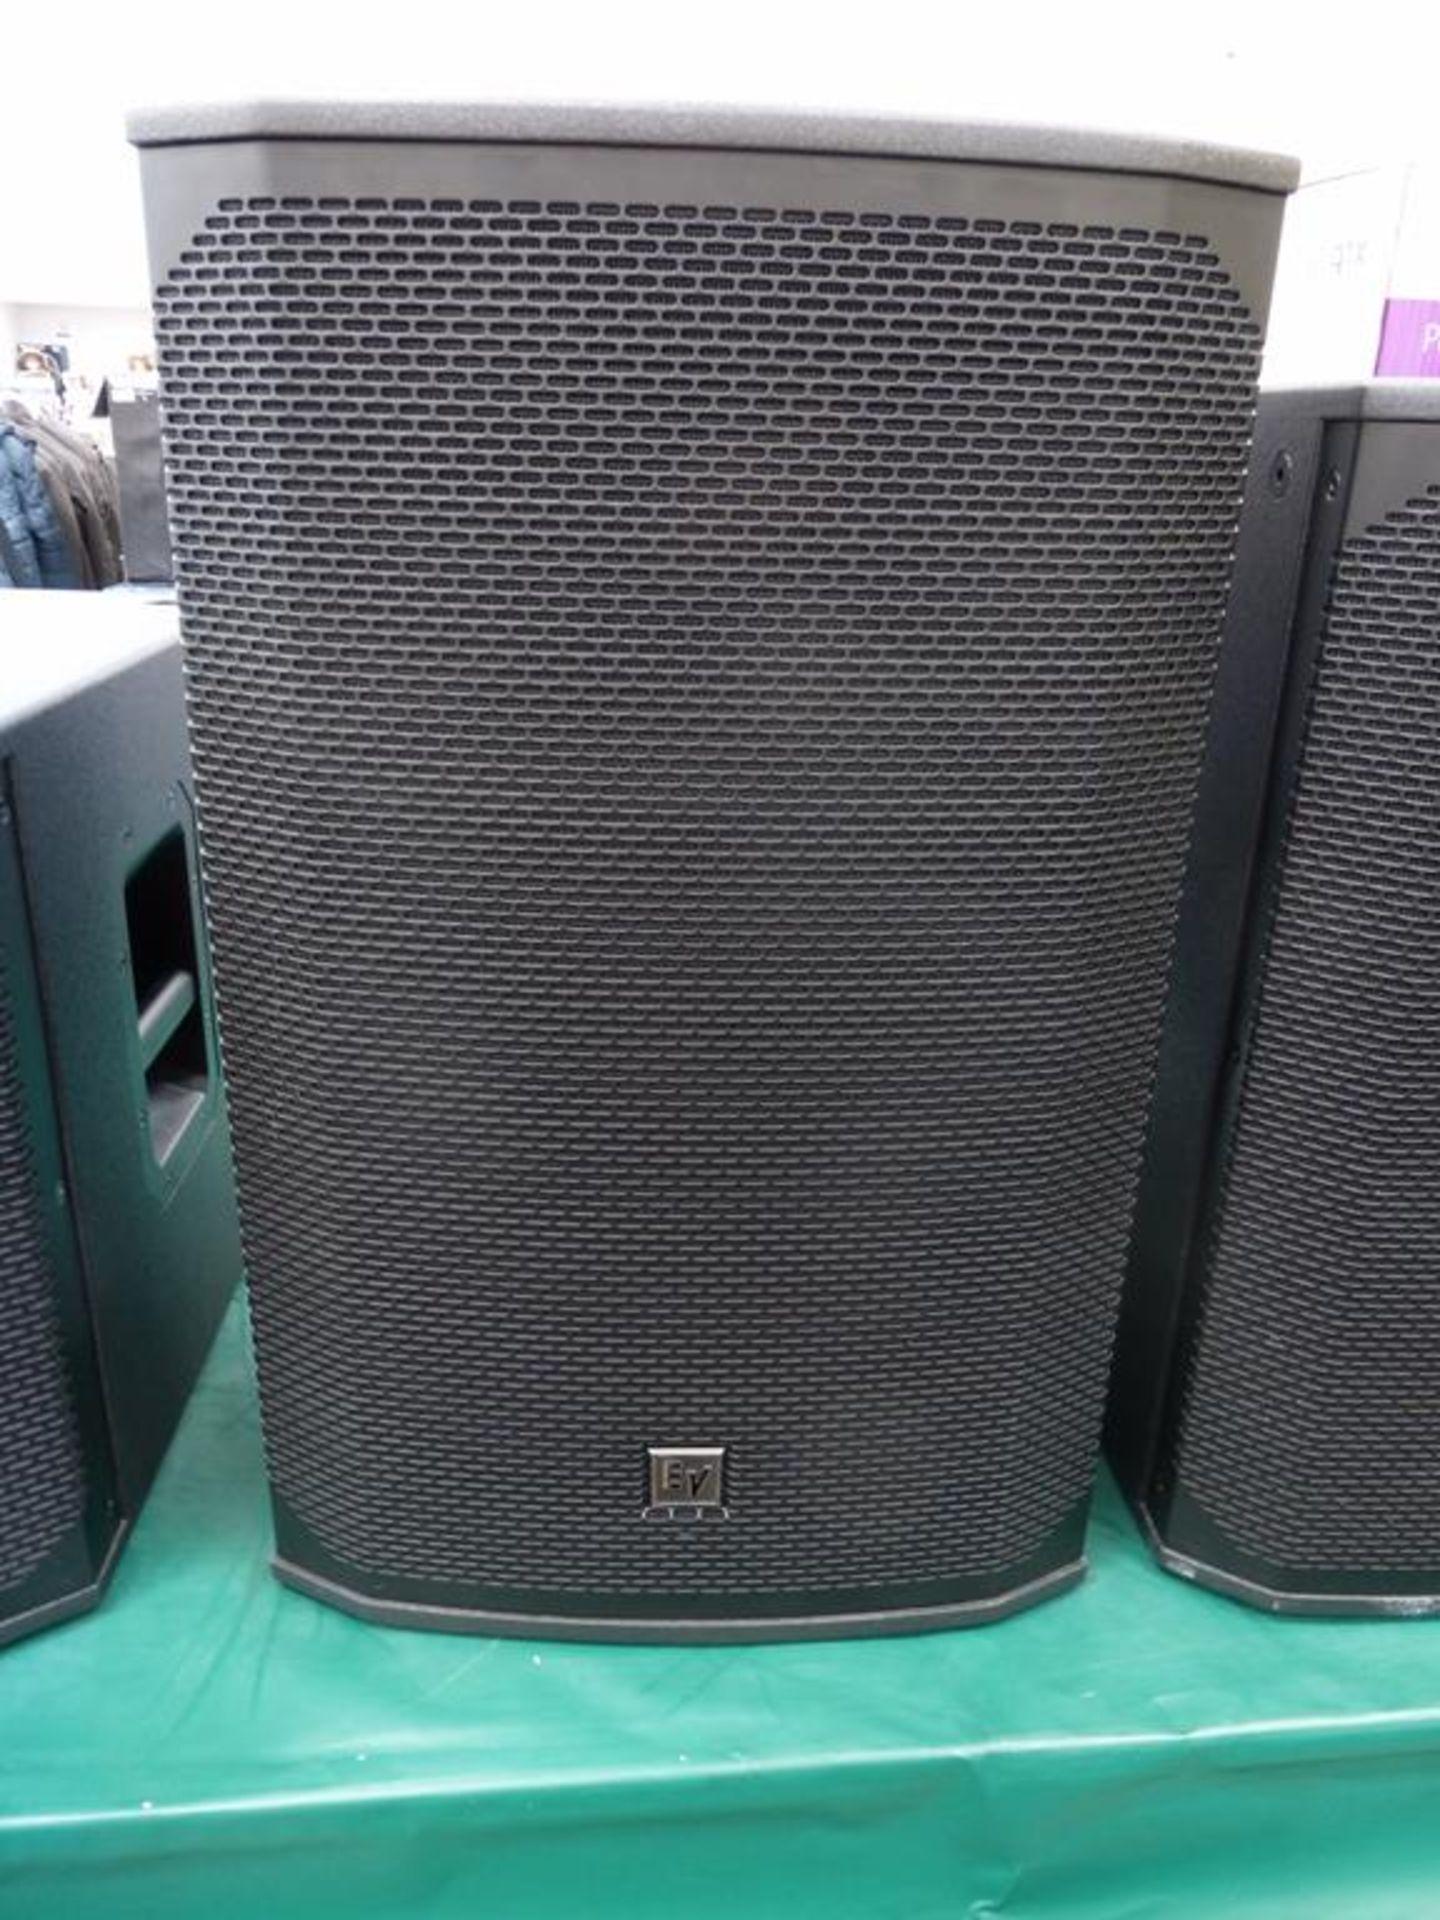 Lot 3 - * Electro-Voice EKX 15P Single 15'' Two-way powered Loudspeaker 90° x 60° Coverage pattern, s/n